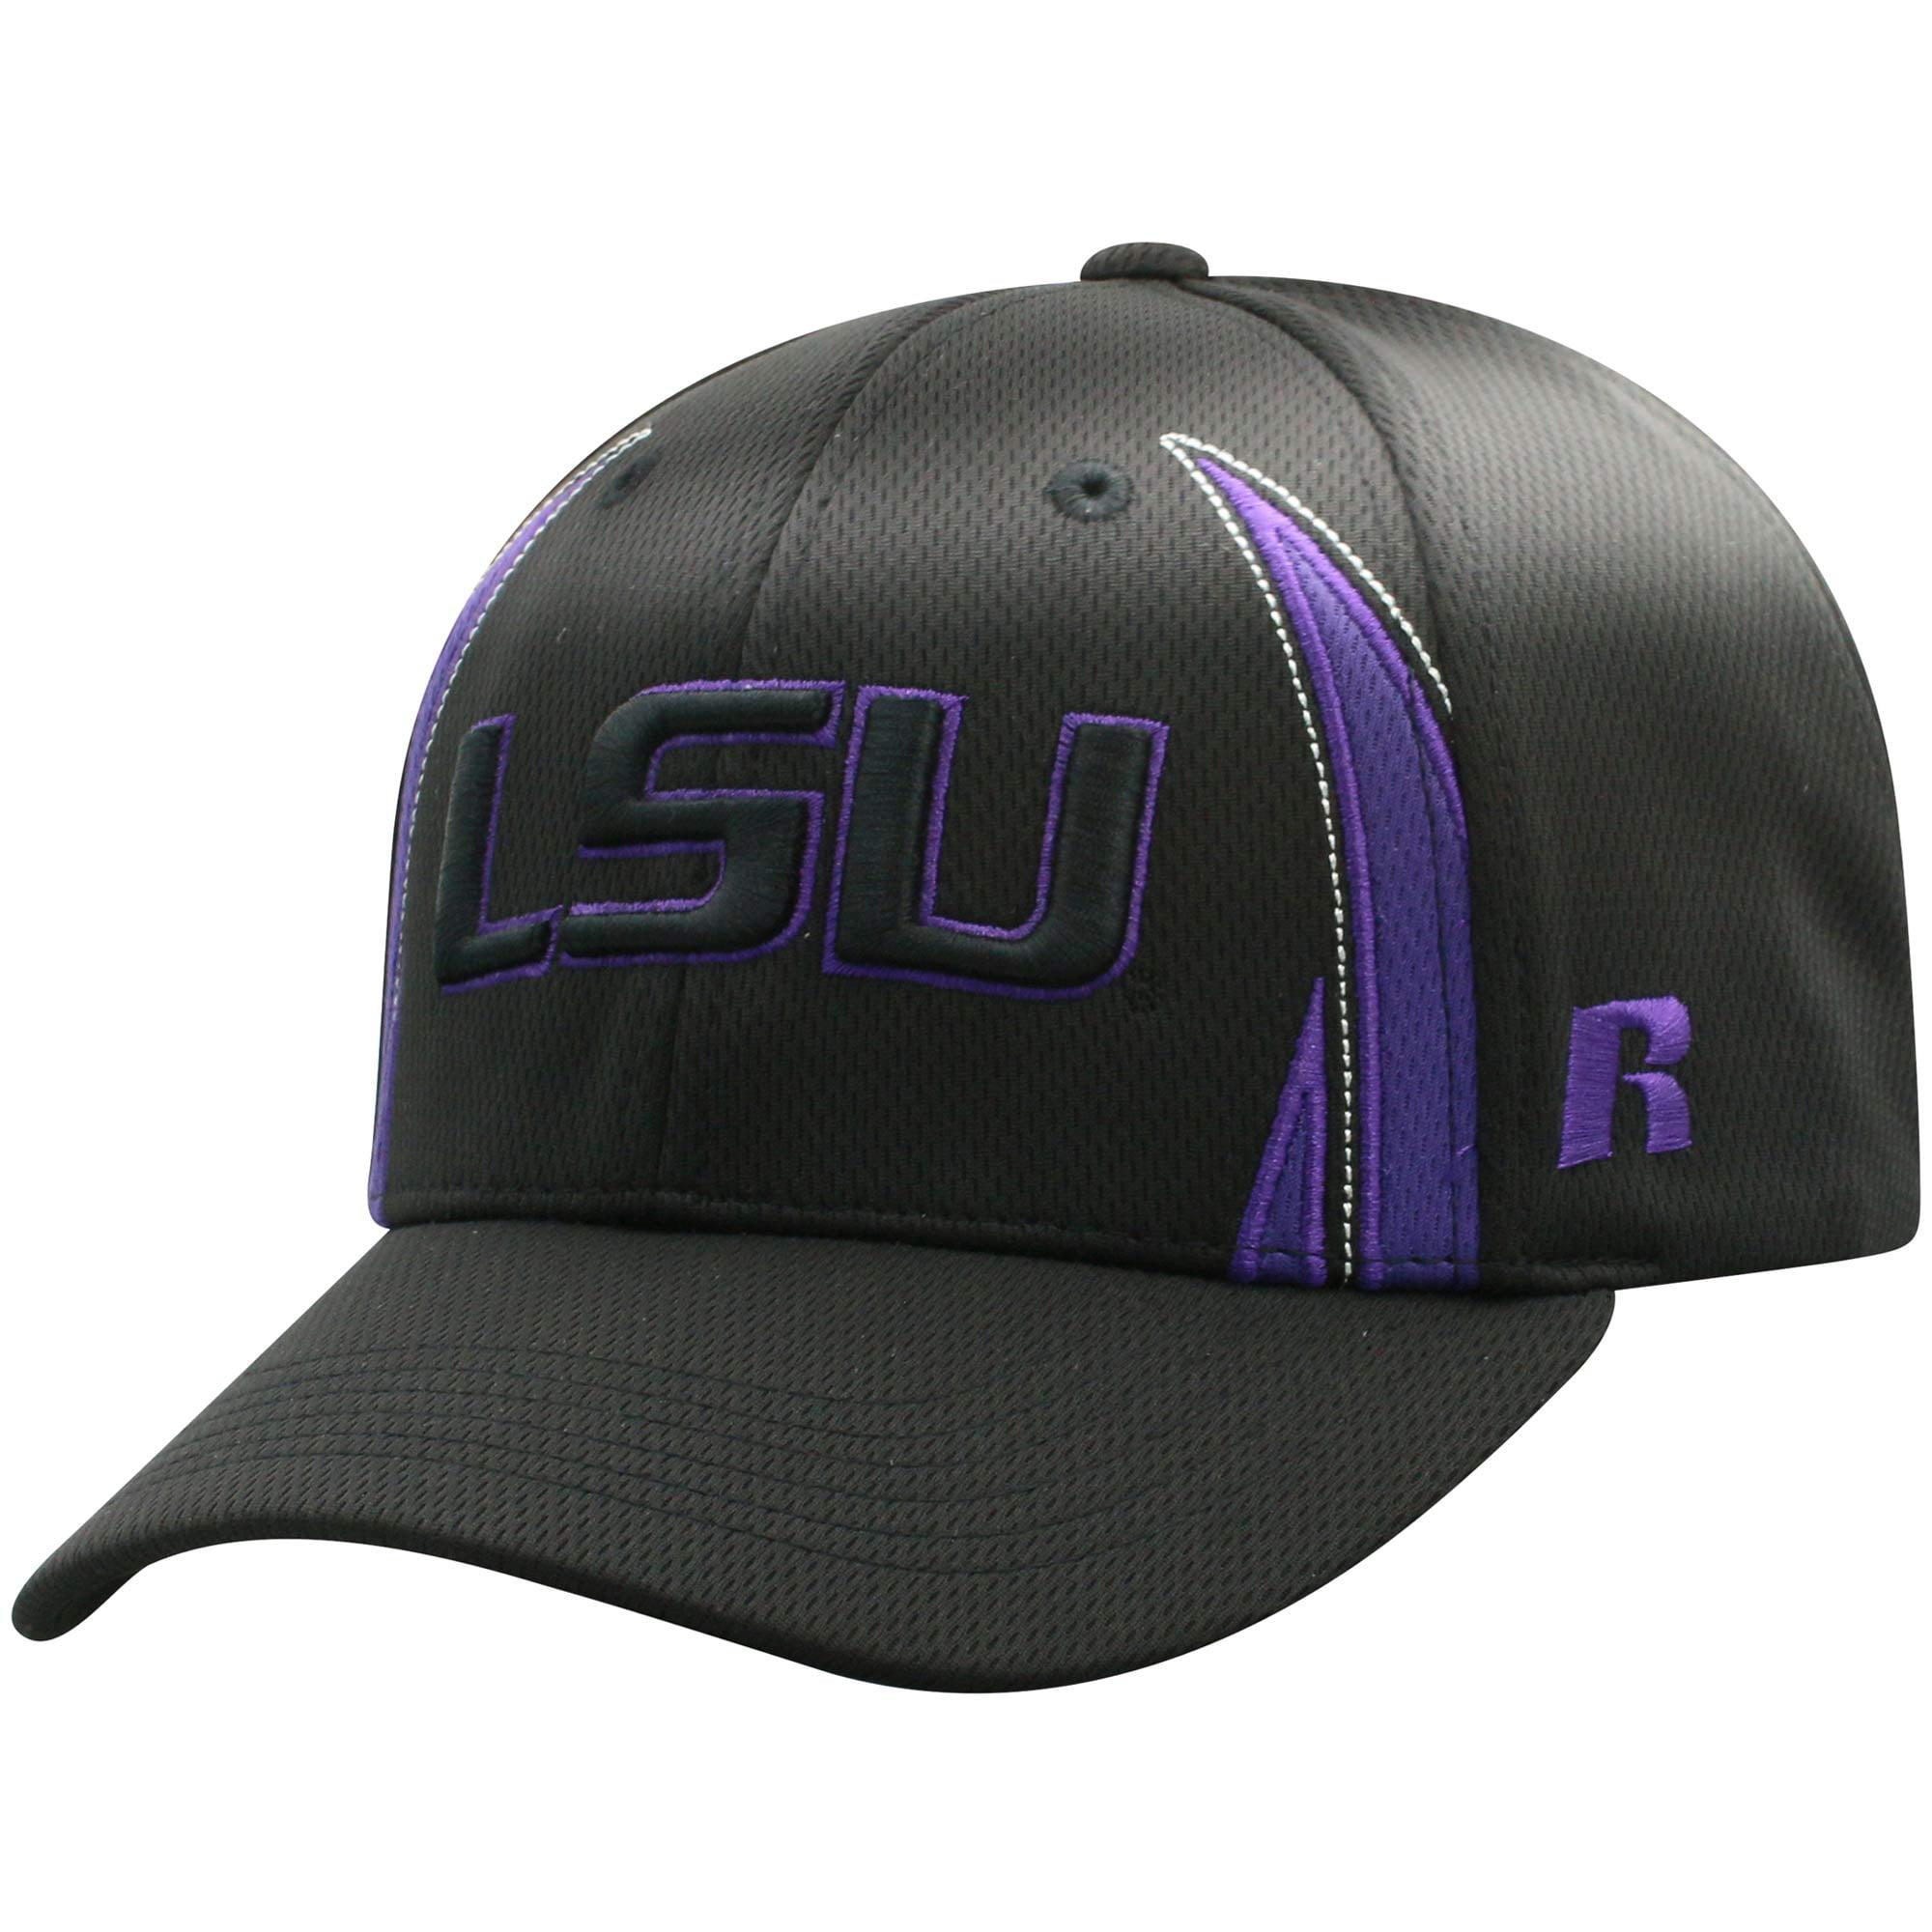 Men's Russell Black LSU Tigers React Adjustable Hat - OSFA